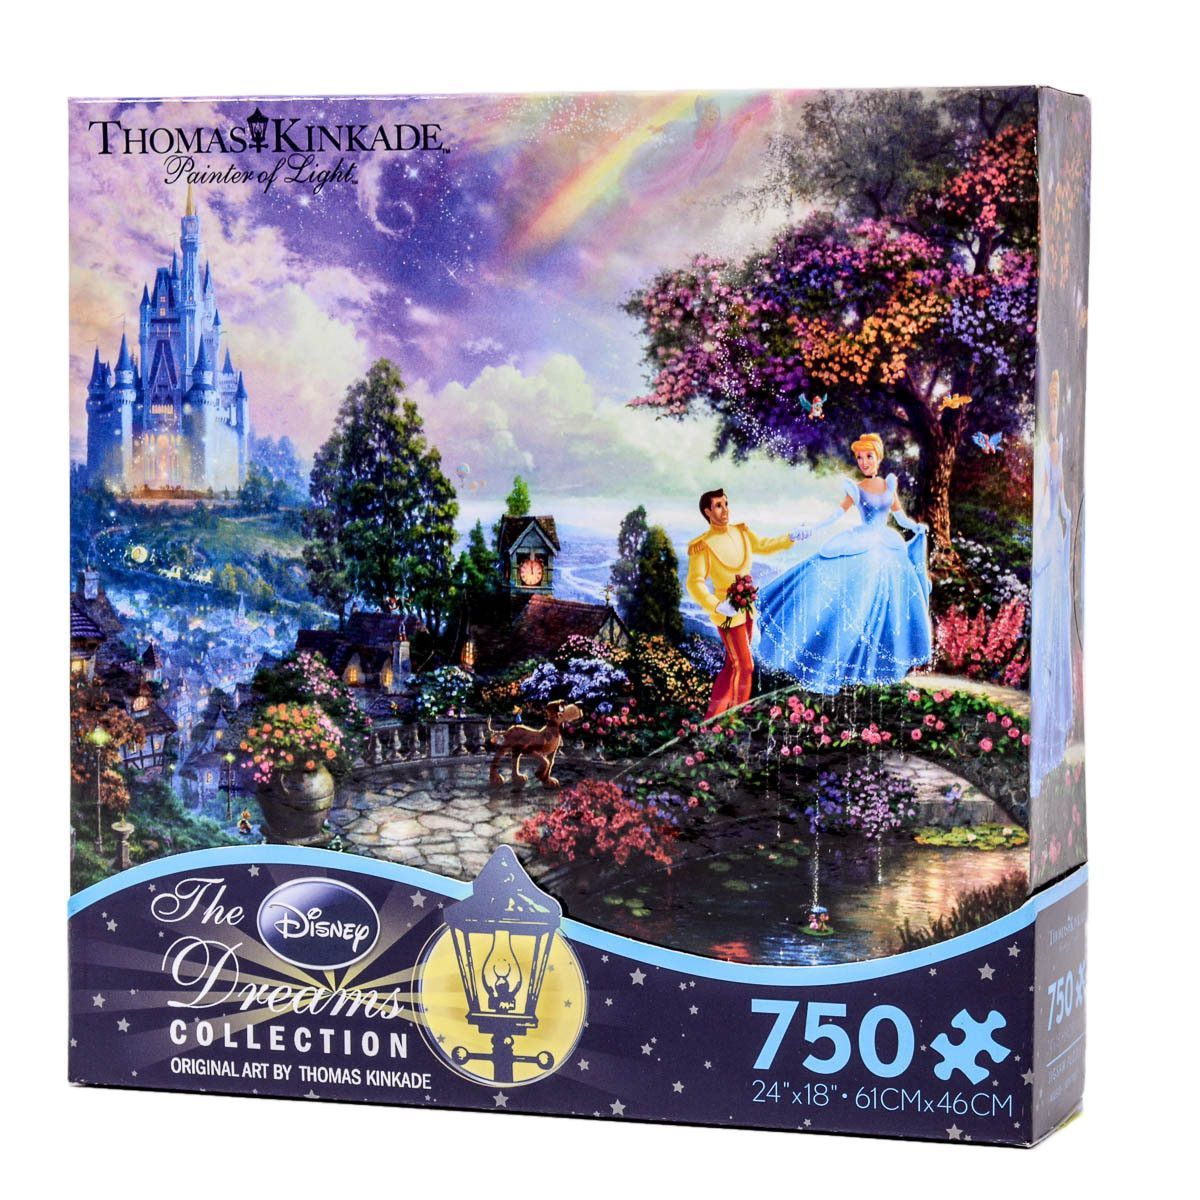 disney thomas kinkade cinderella wishes upon a dream 750 pcs puzzle new with box